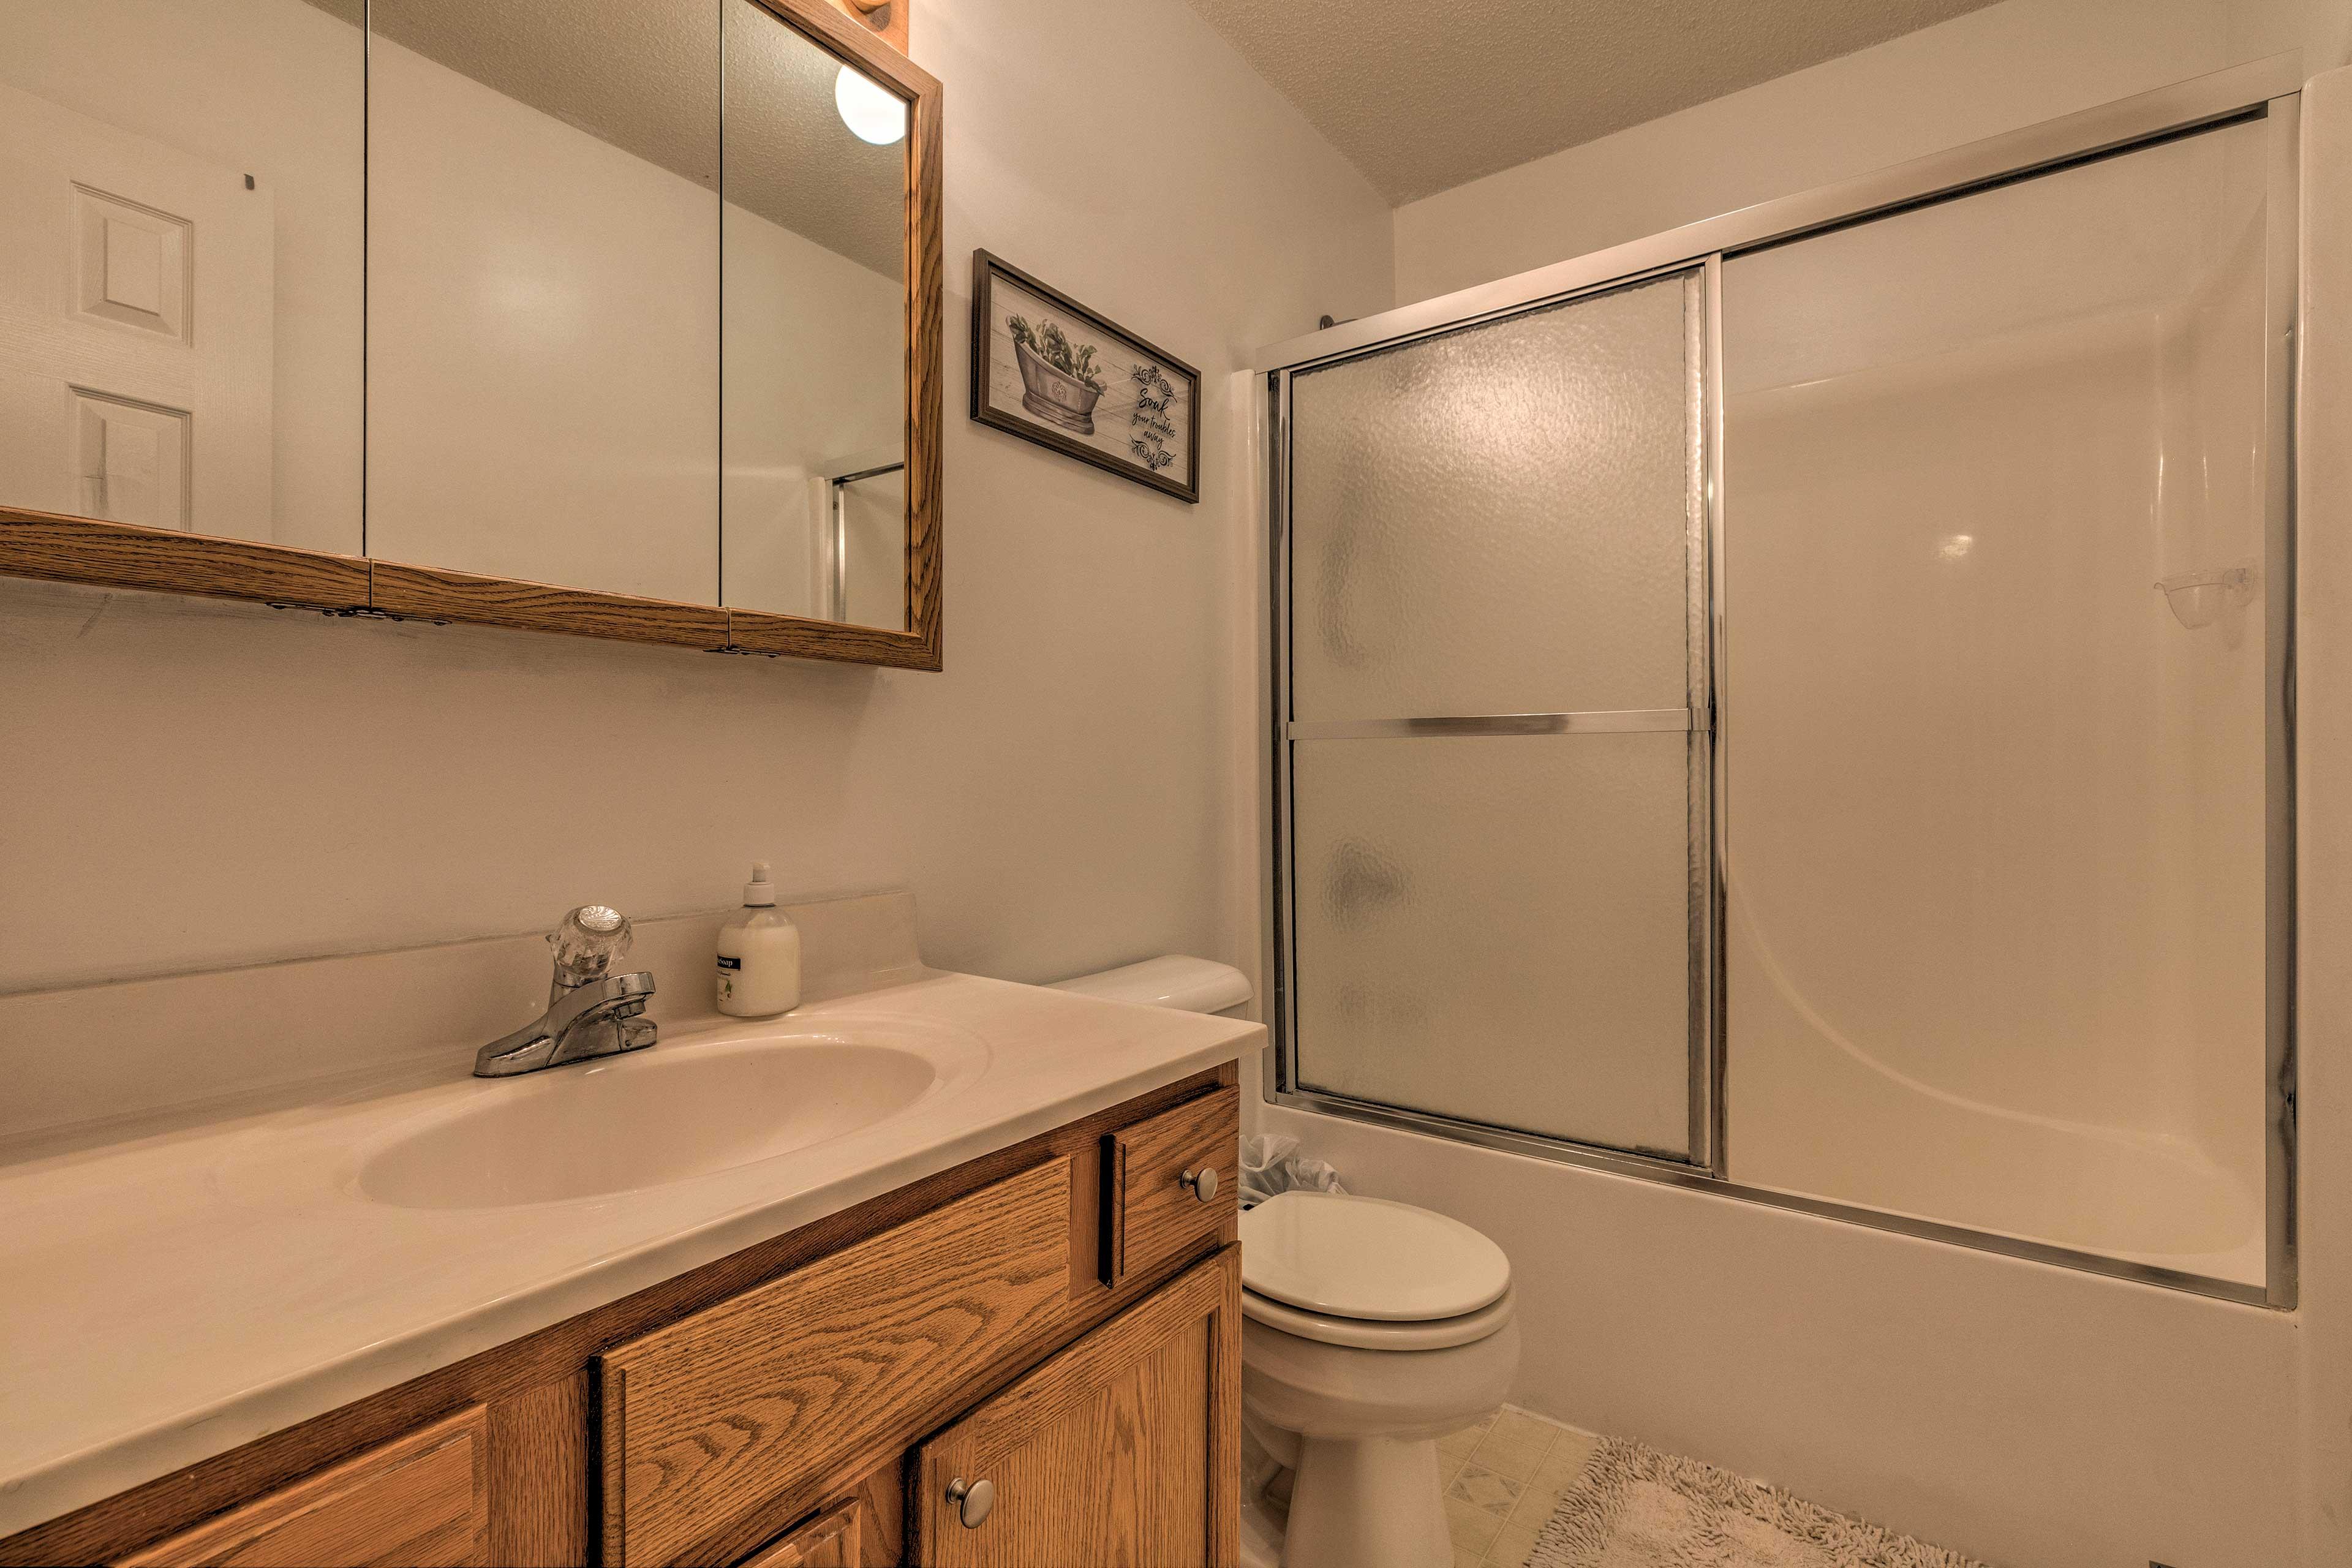 Sliding glass doors line this shower/tub combo in this full bathroom.